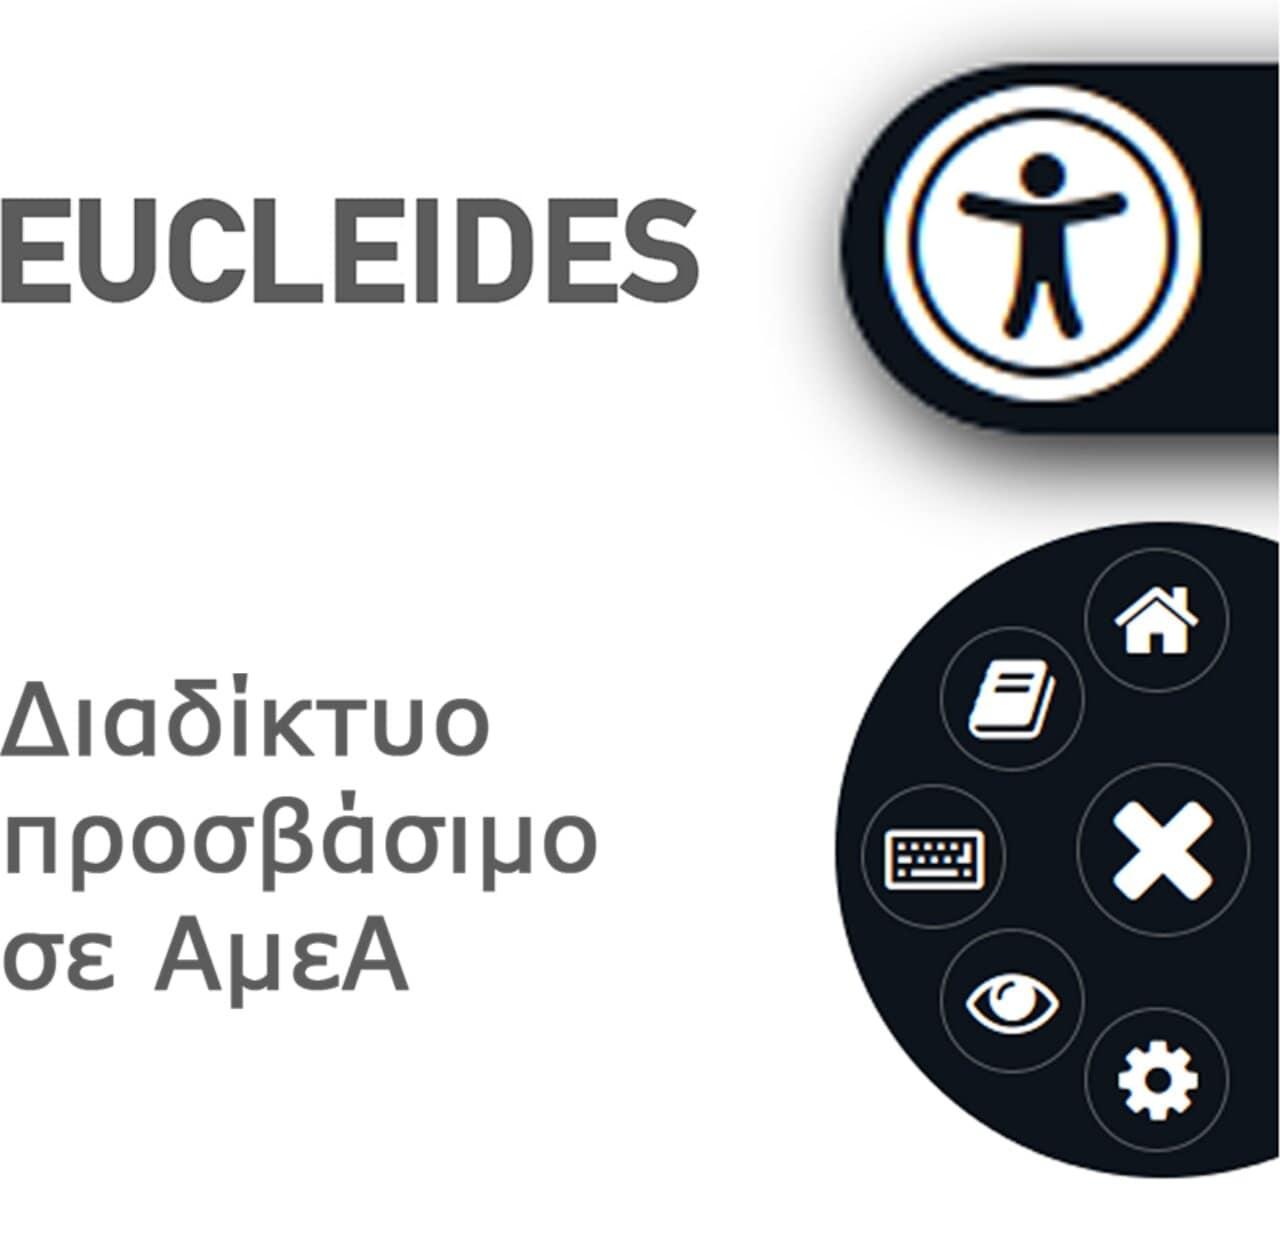 Eucleides: Μπάρα προσβασιμότητας για ιστοσελίδες